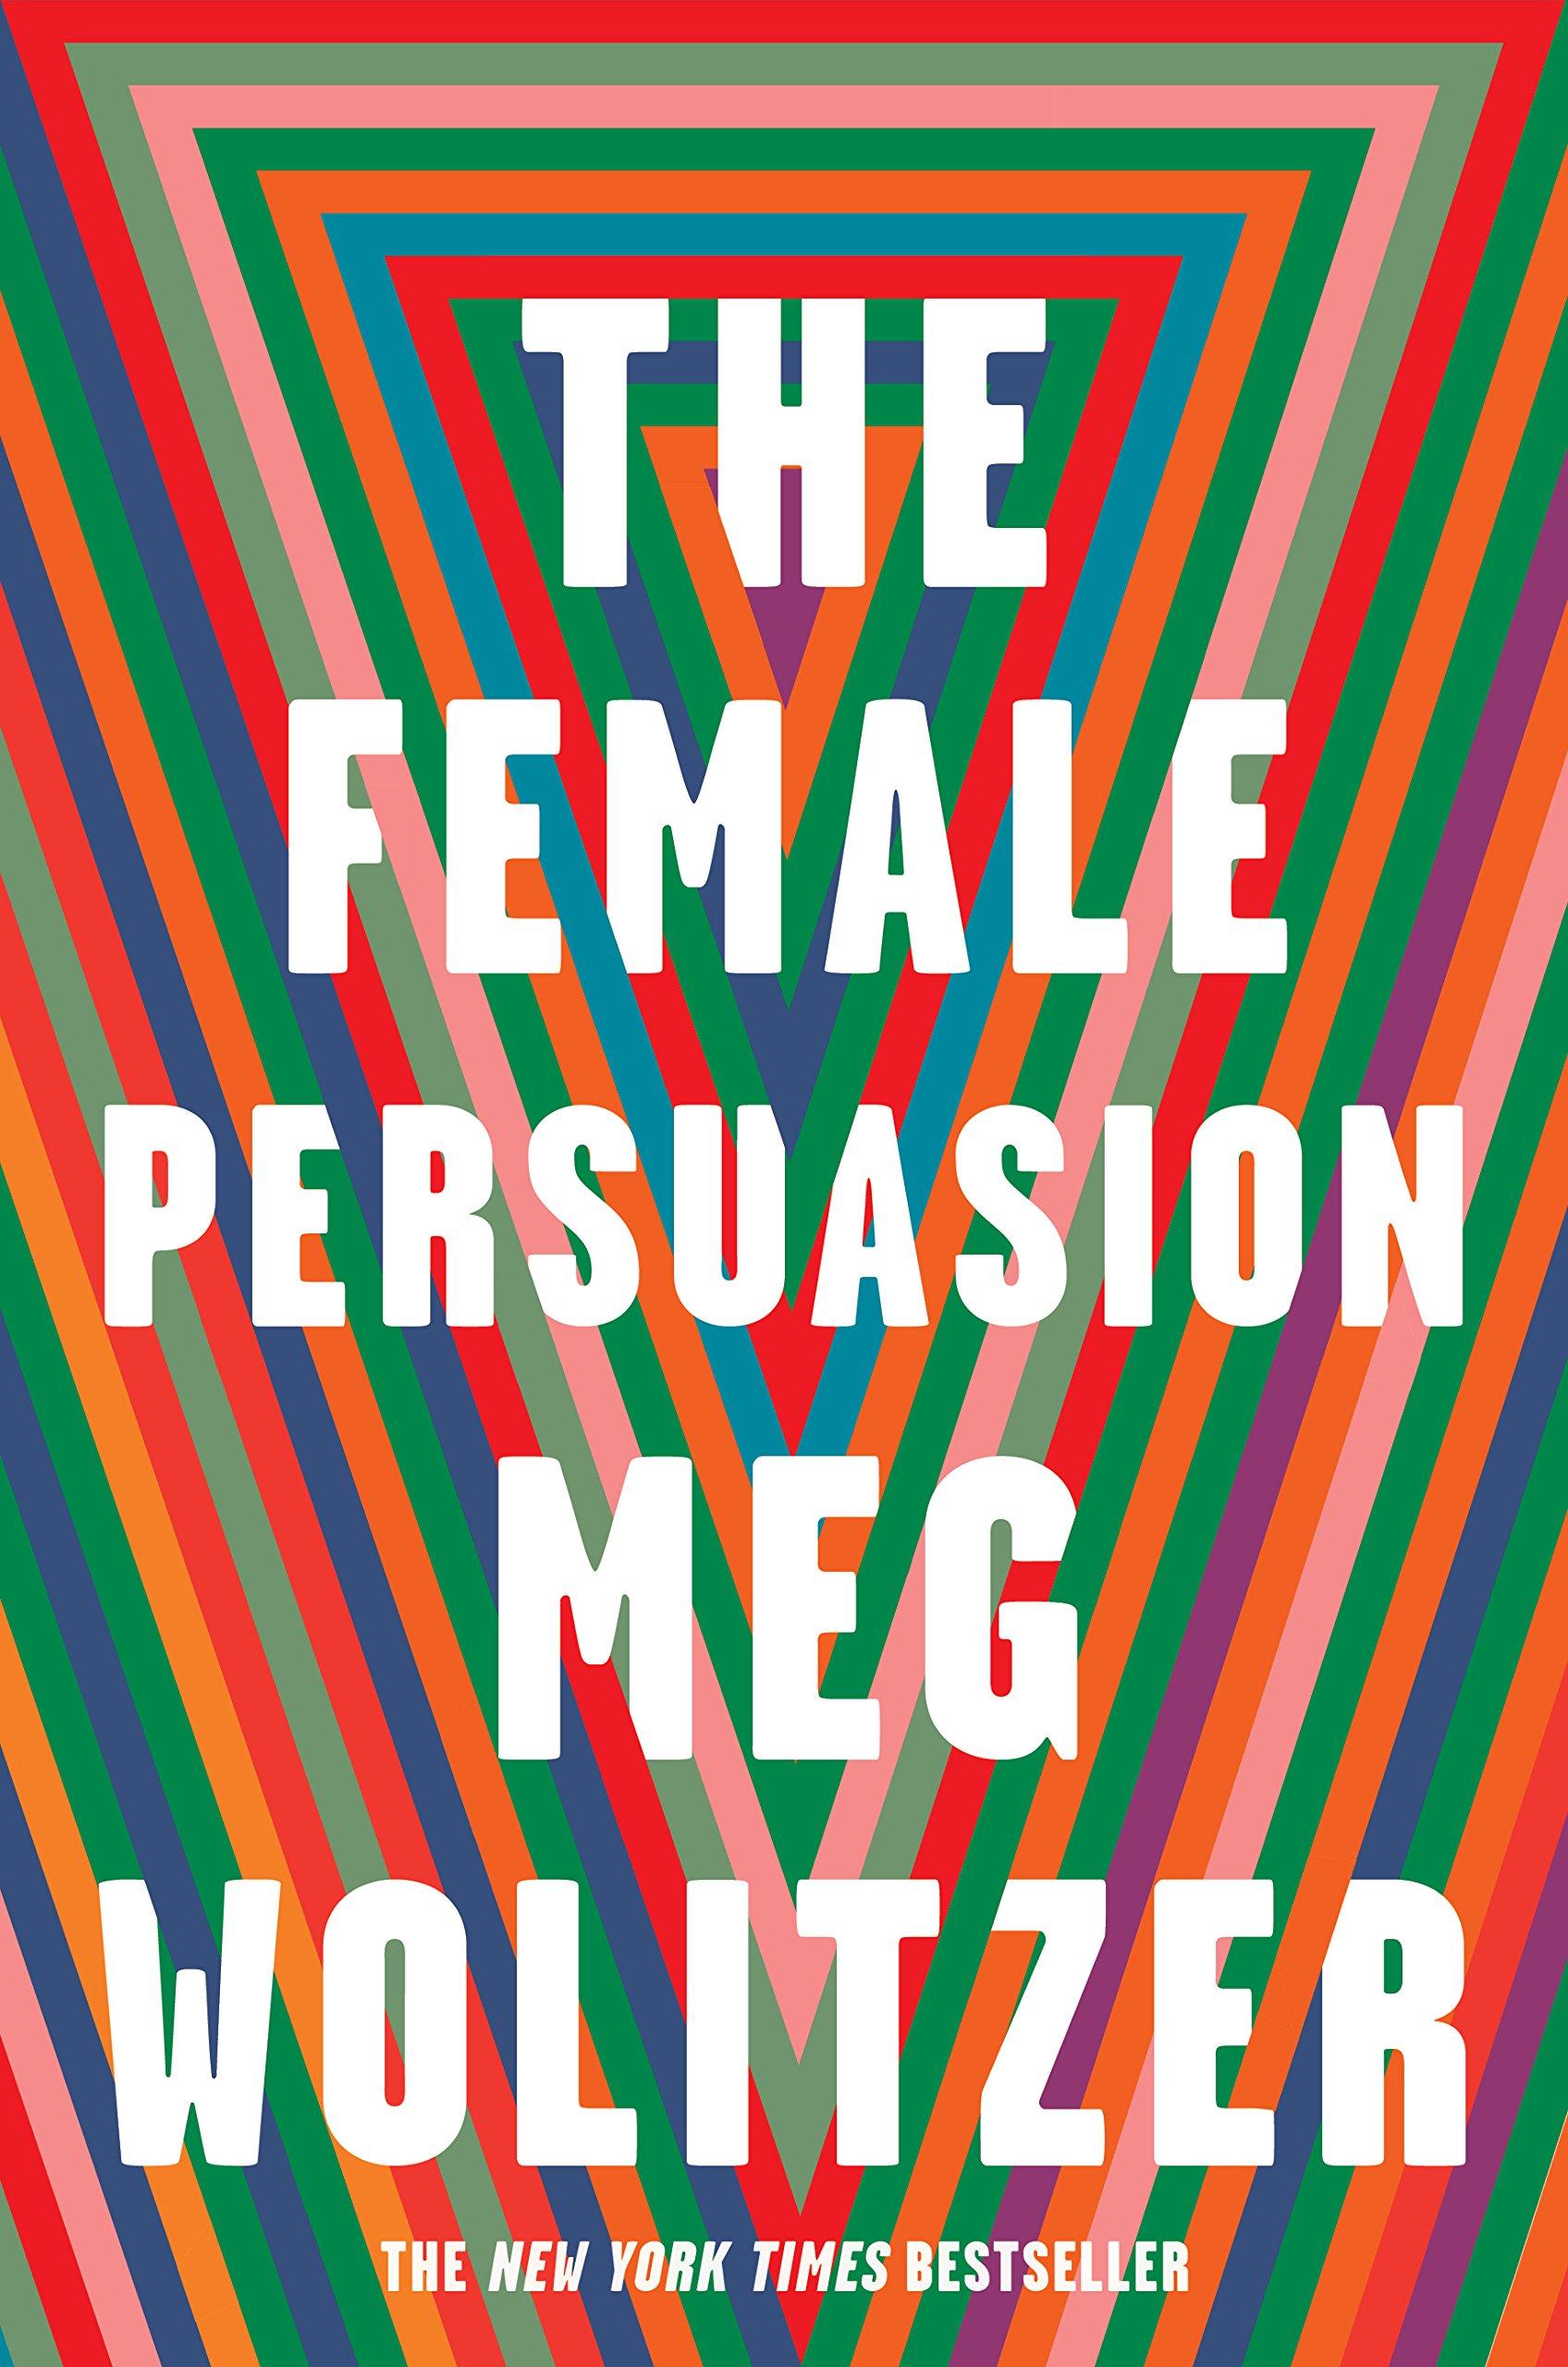 The Female Persuasion: Amazon.de: Meg Wolitzer: Fremdsprachige Bücher